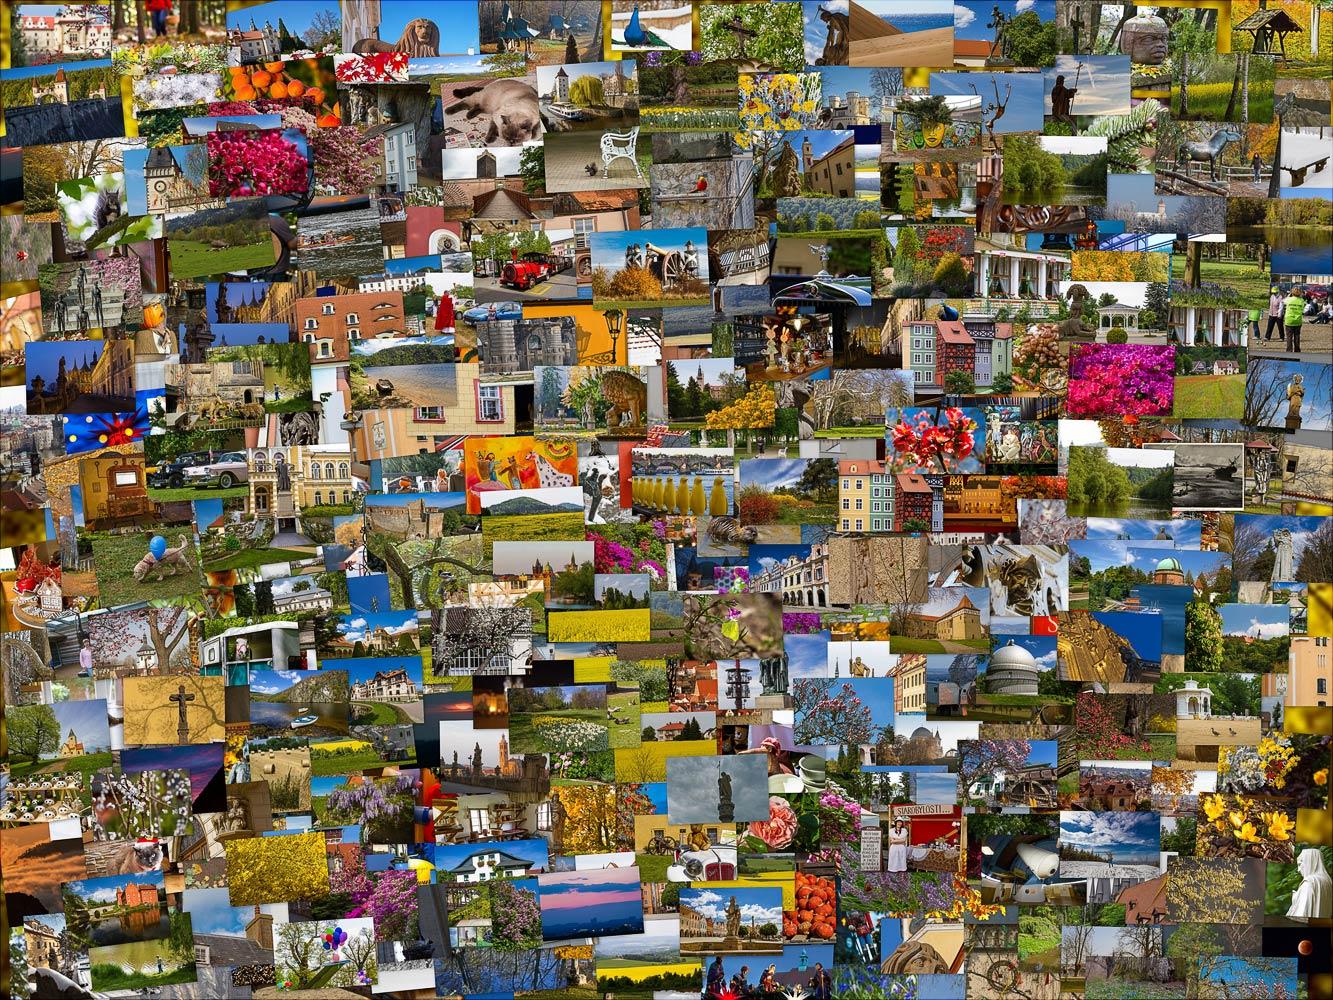 http://countryczech.com/wp-content/uploads/2016/04/photos/2015-2016.jpg